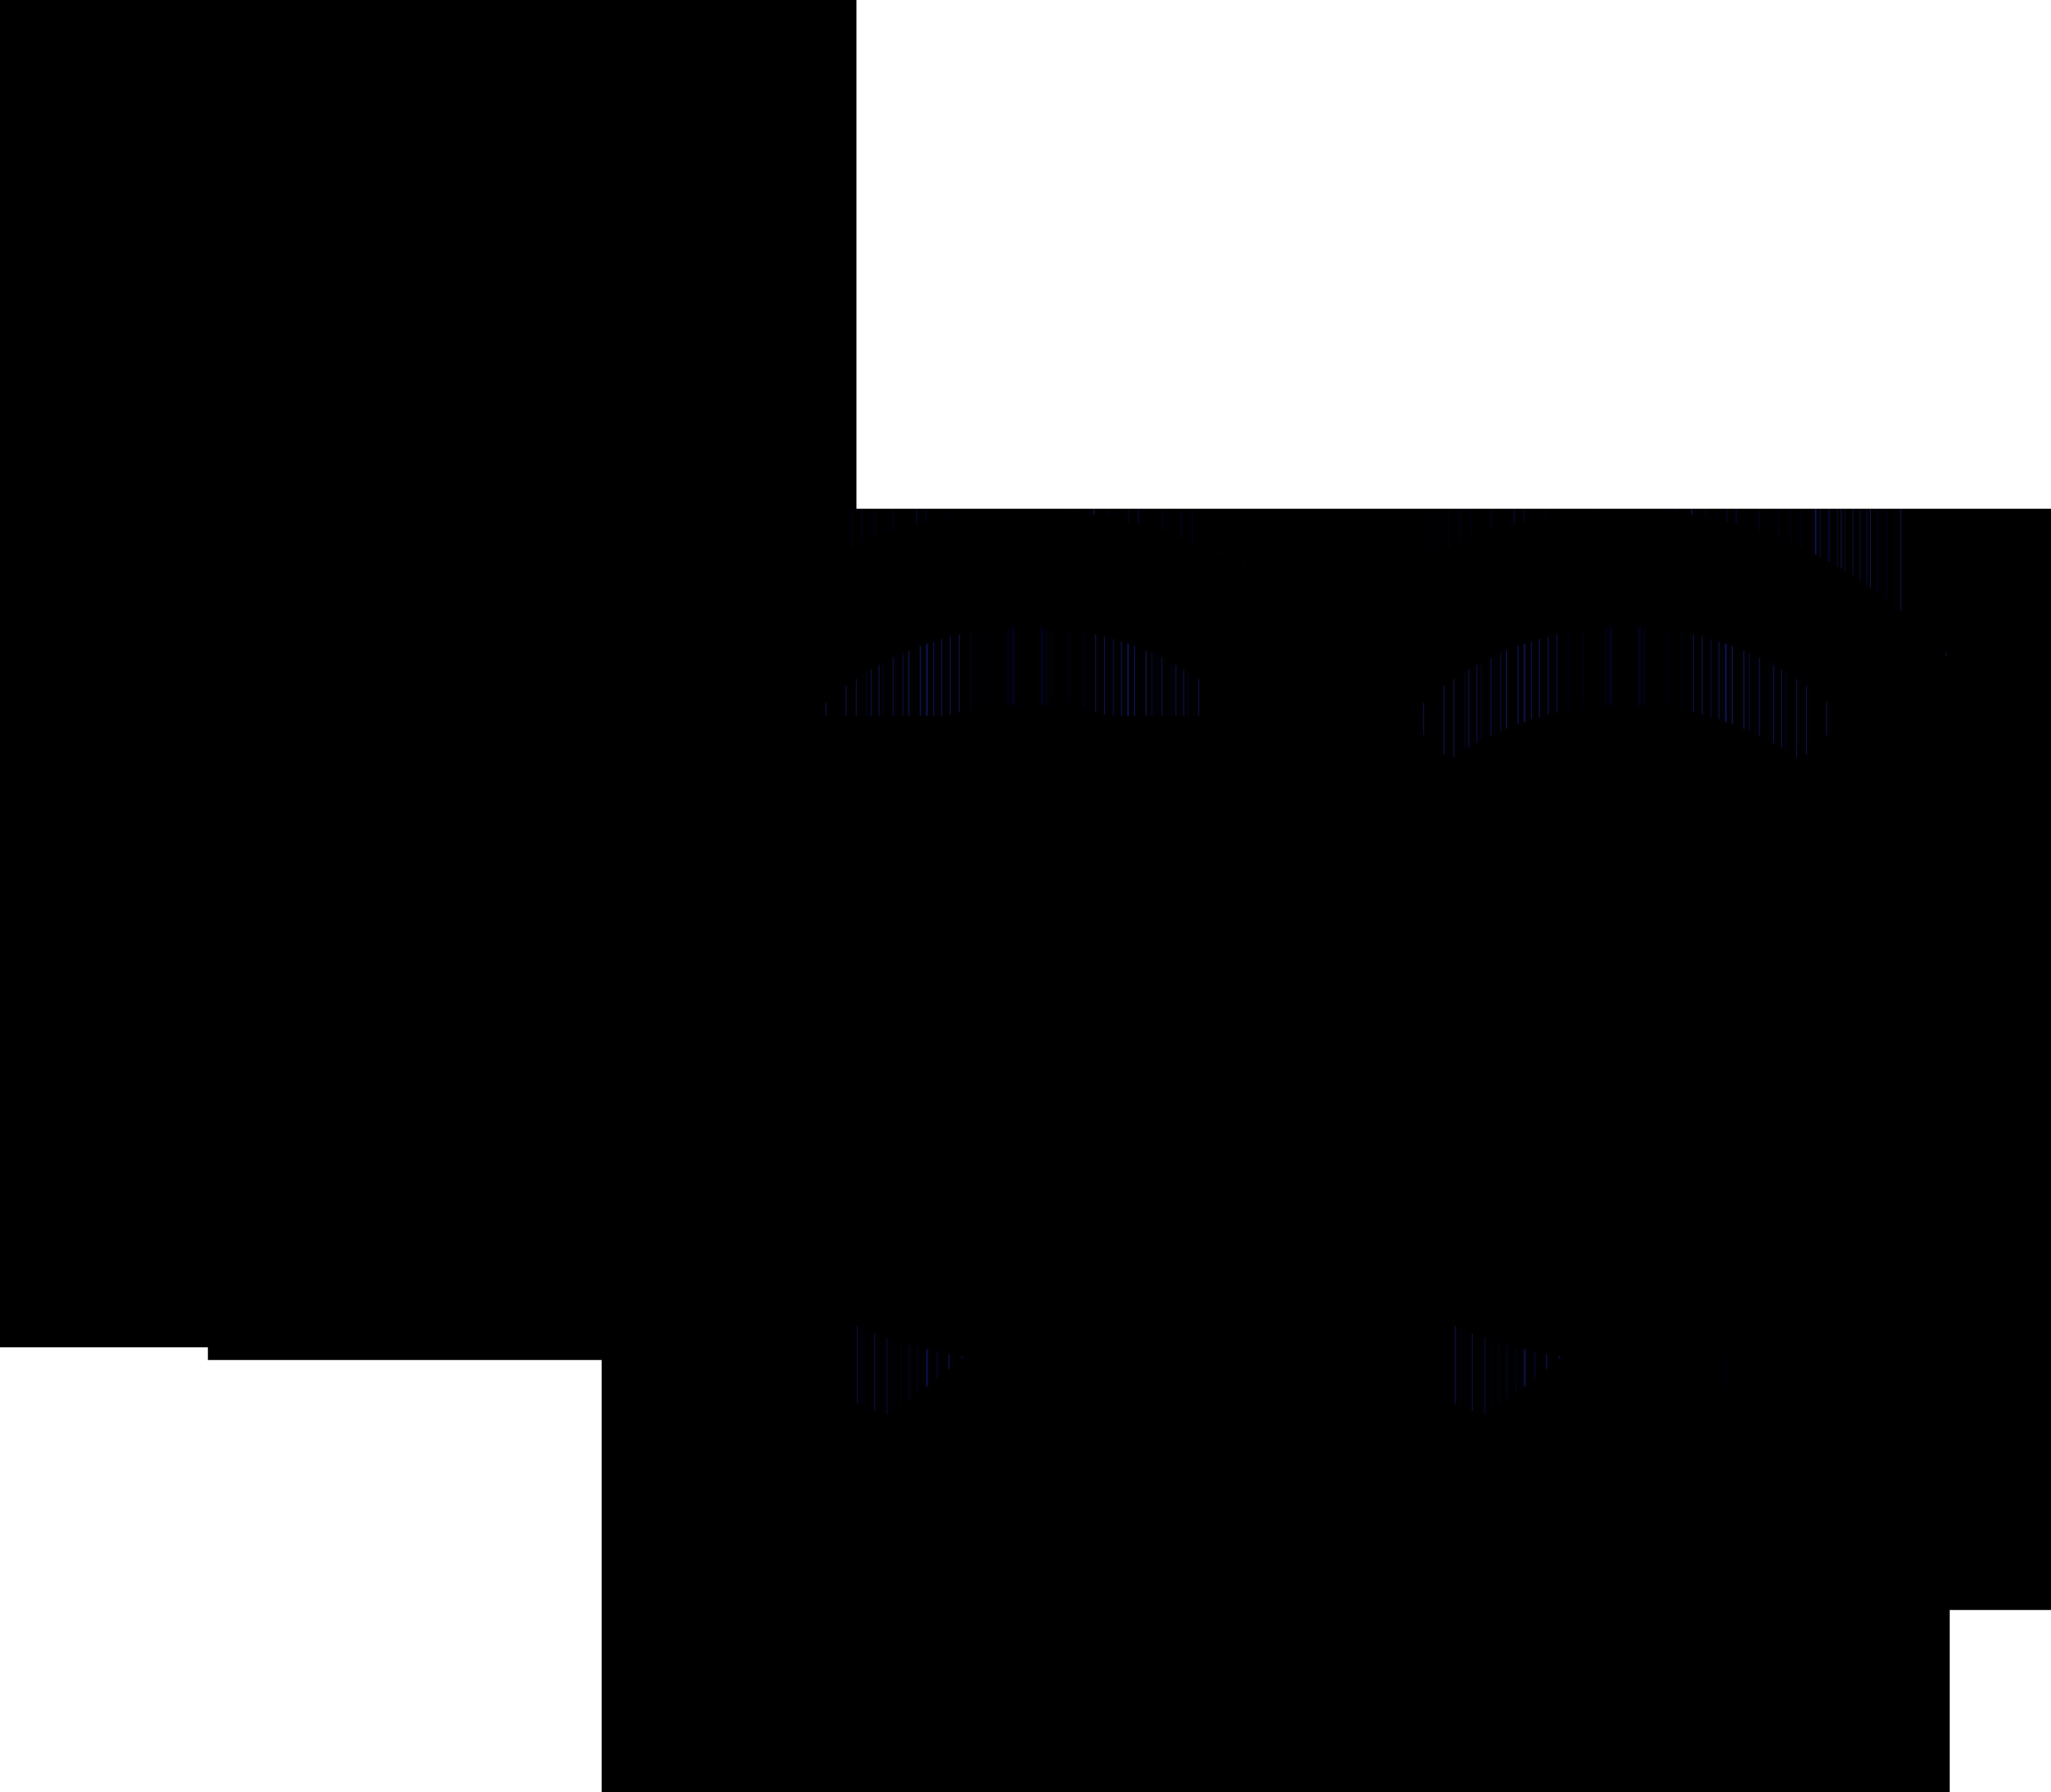 Nonbinary woman symbol interlocked with a nonbinary symbol and a Venus symbol.